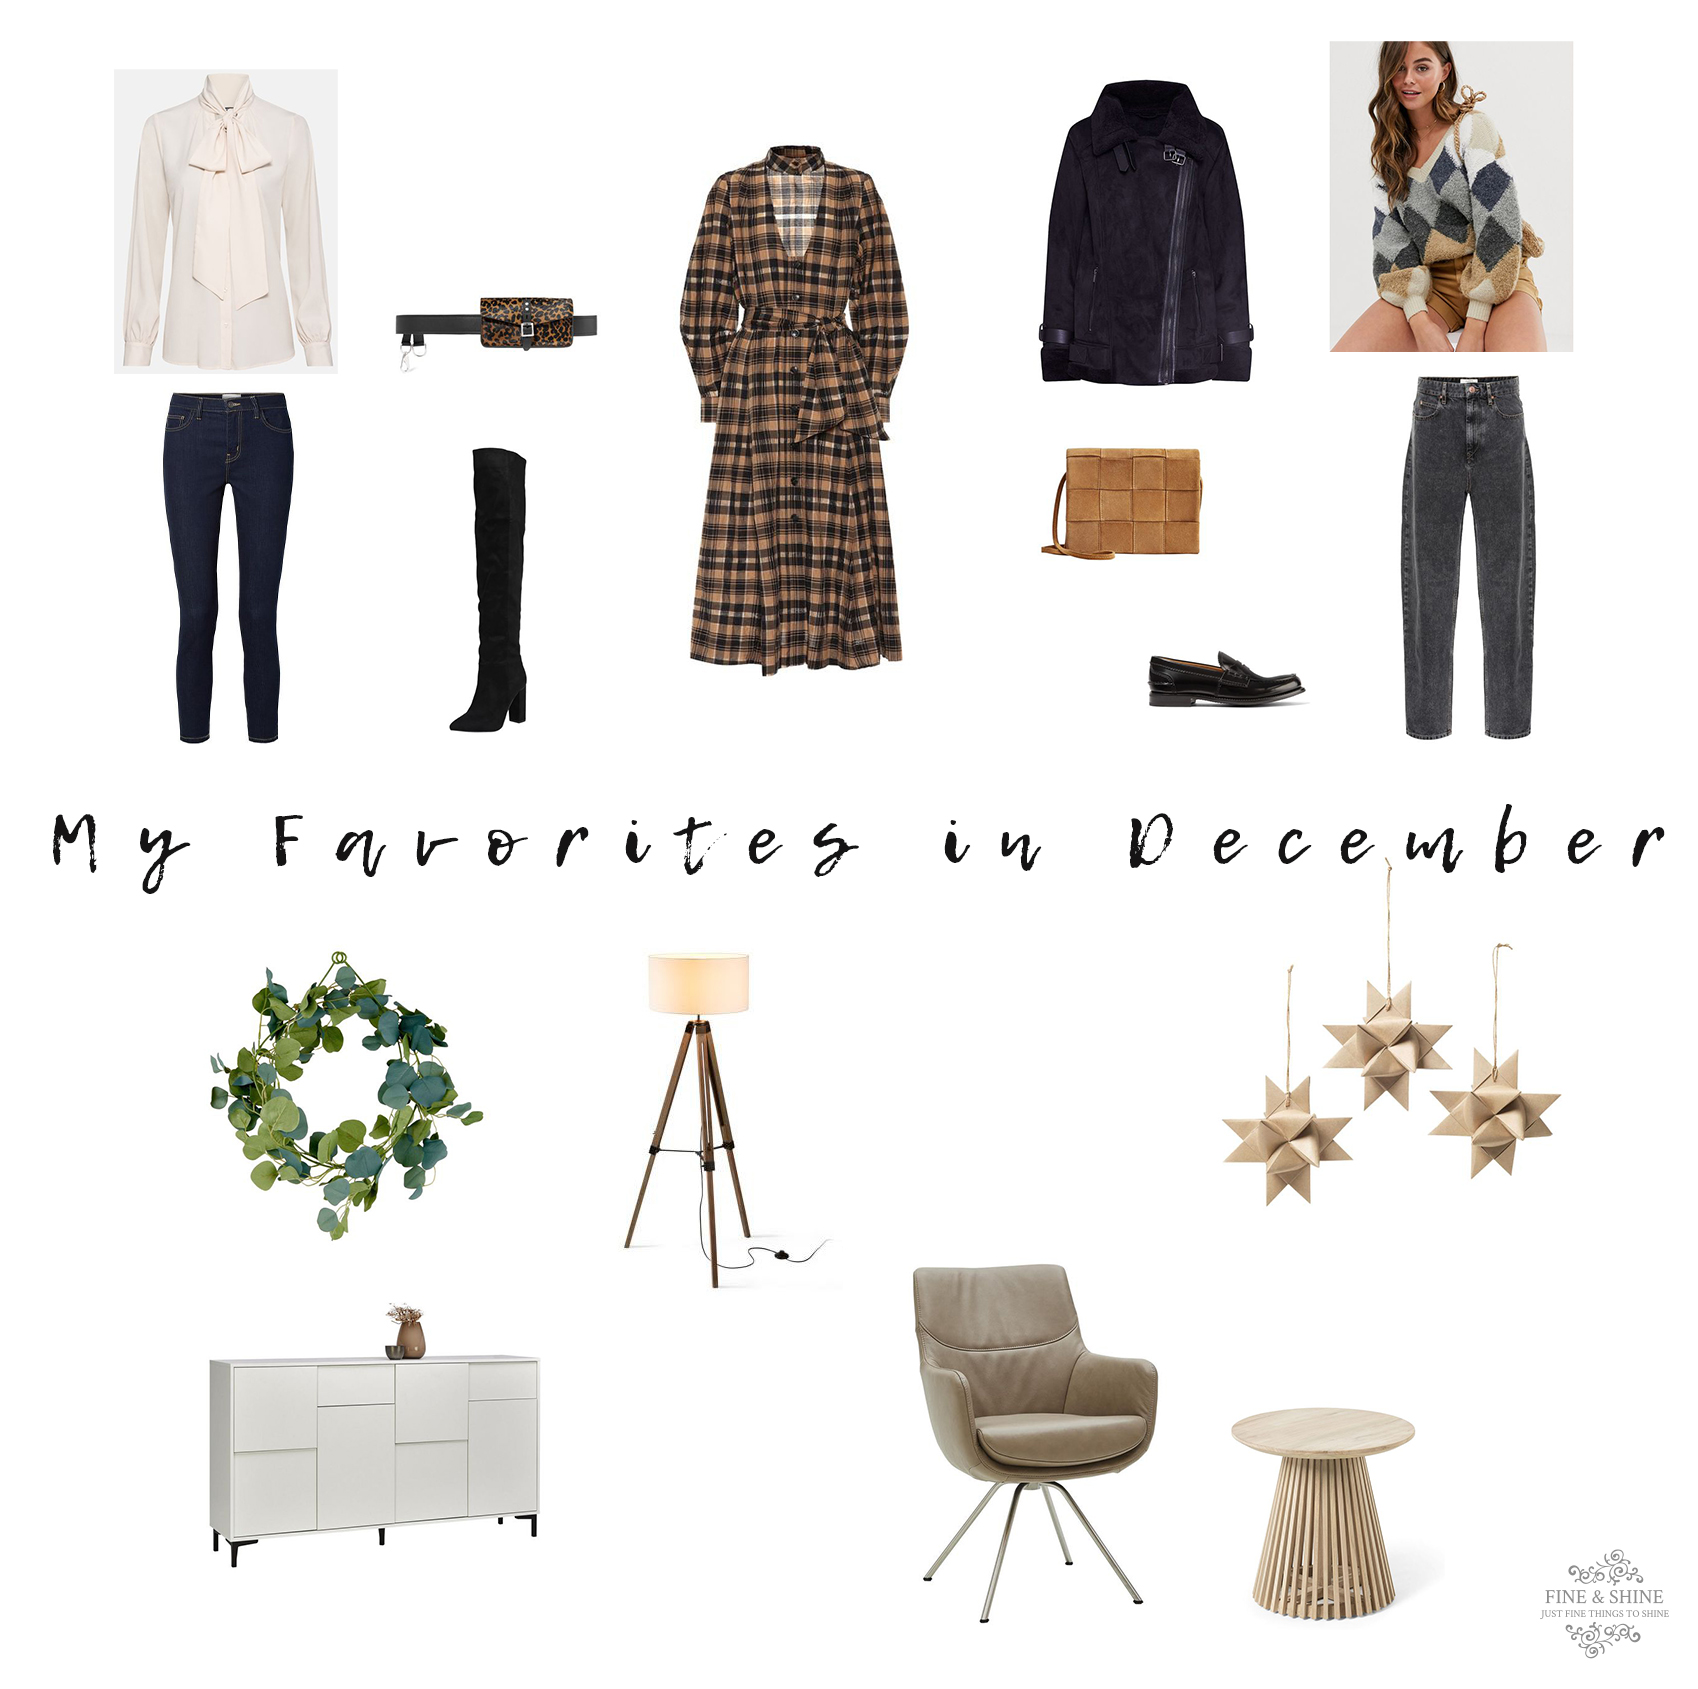 My Favorites in December